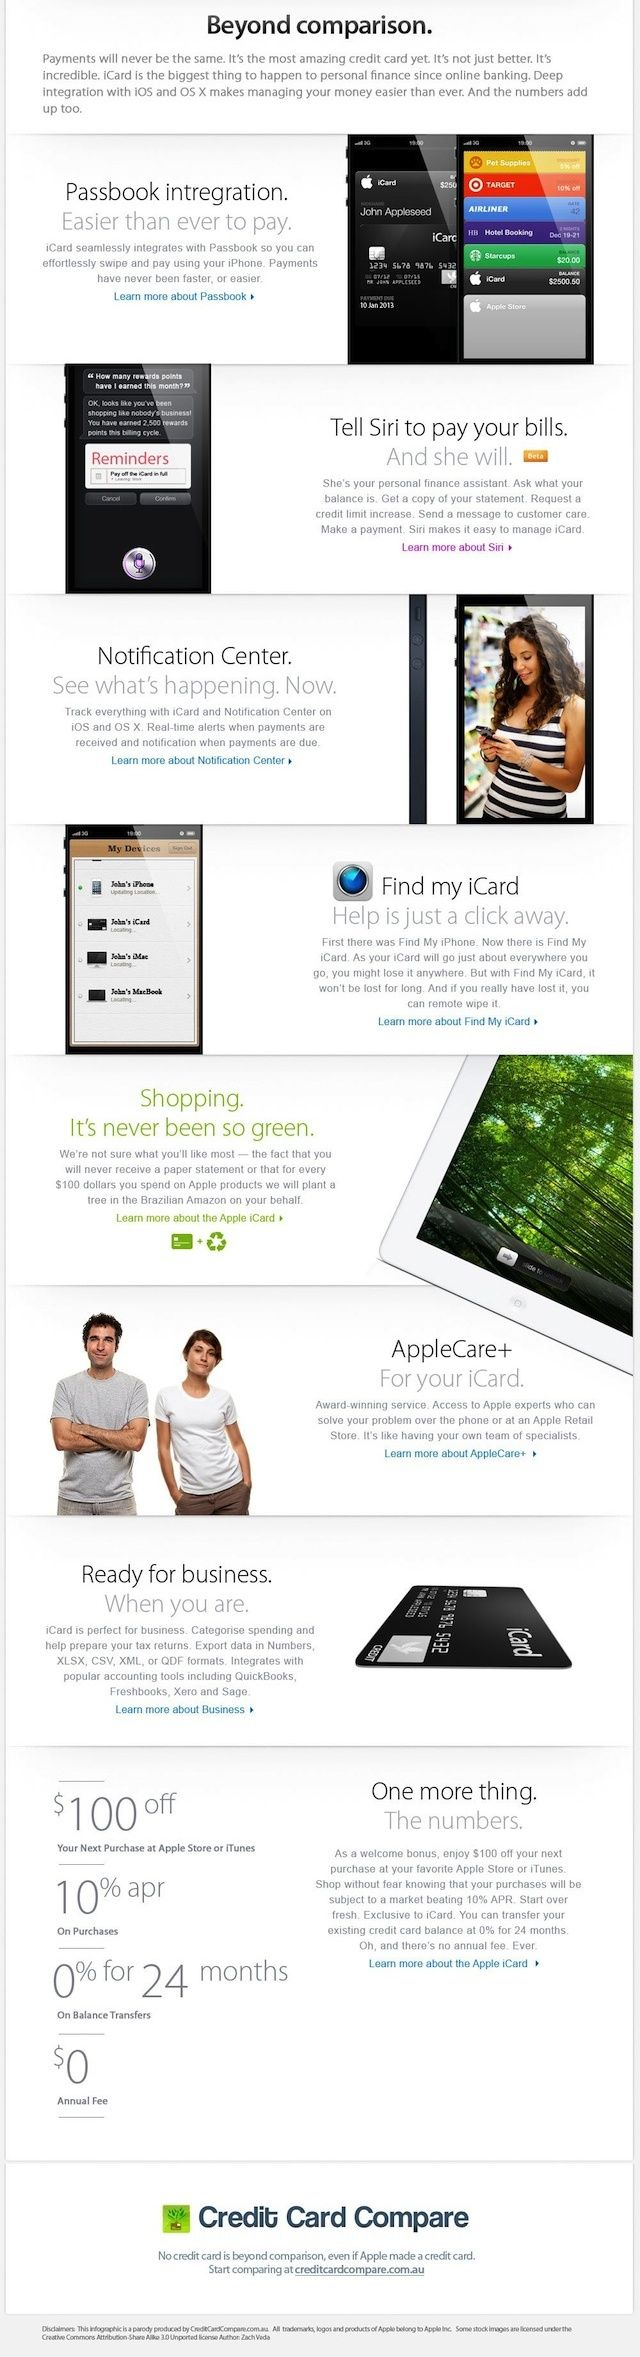 icard-apple